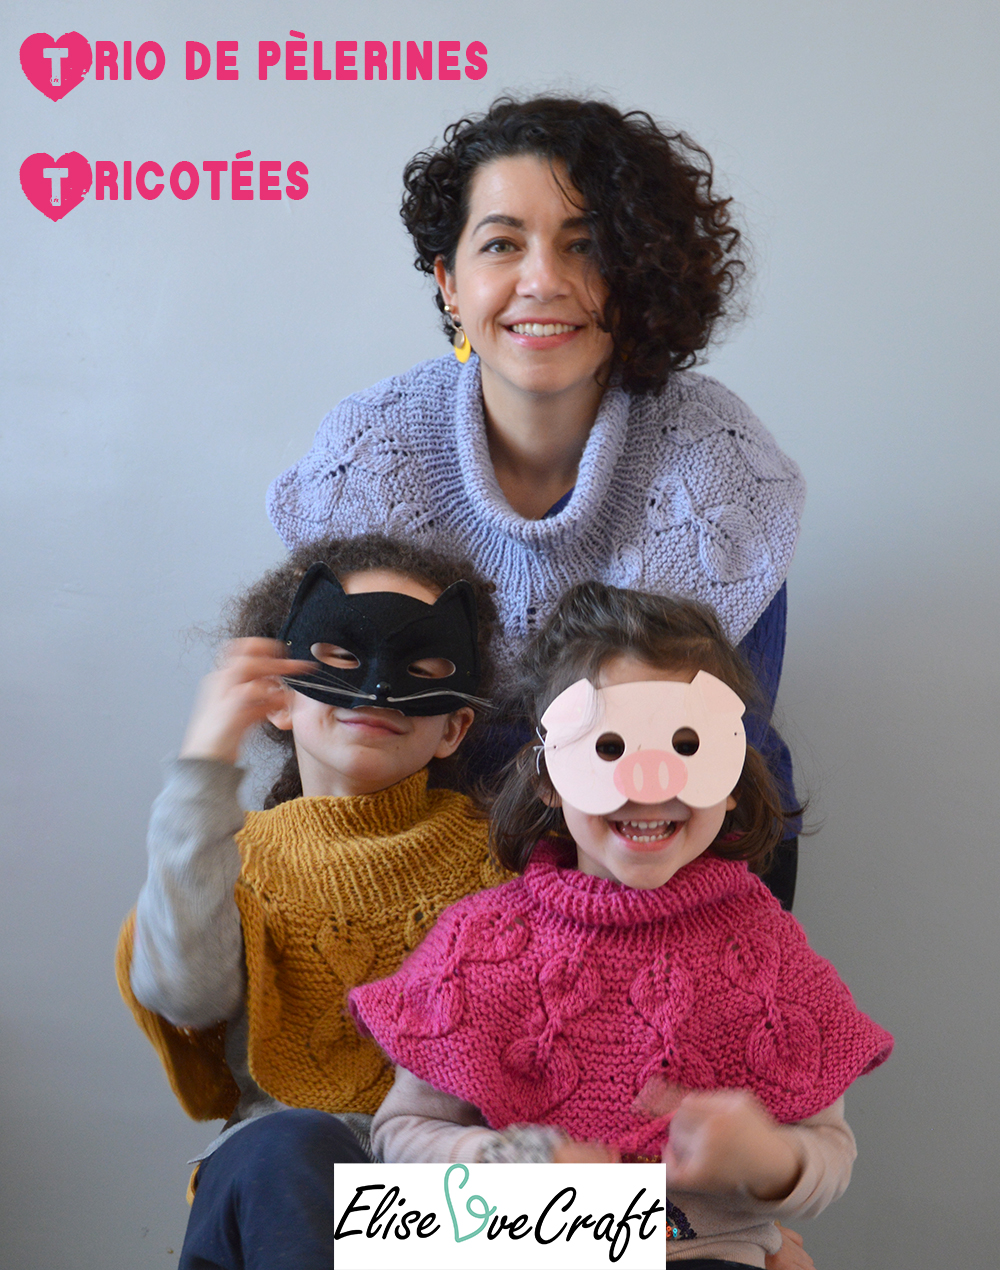 pelerines tricotees pin-it